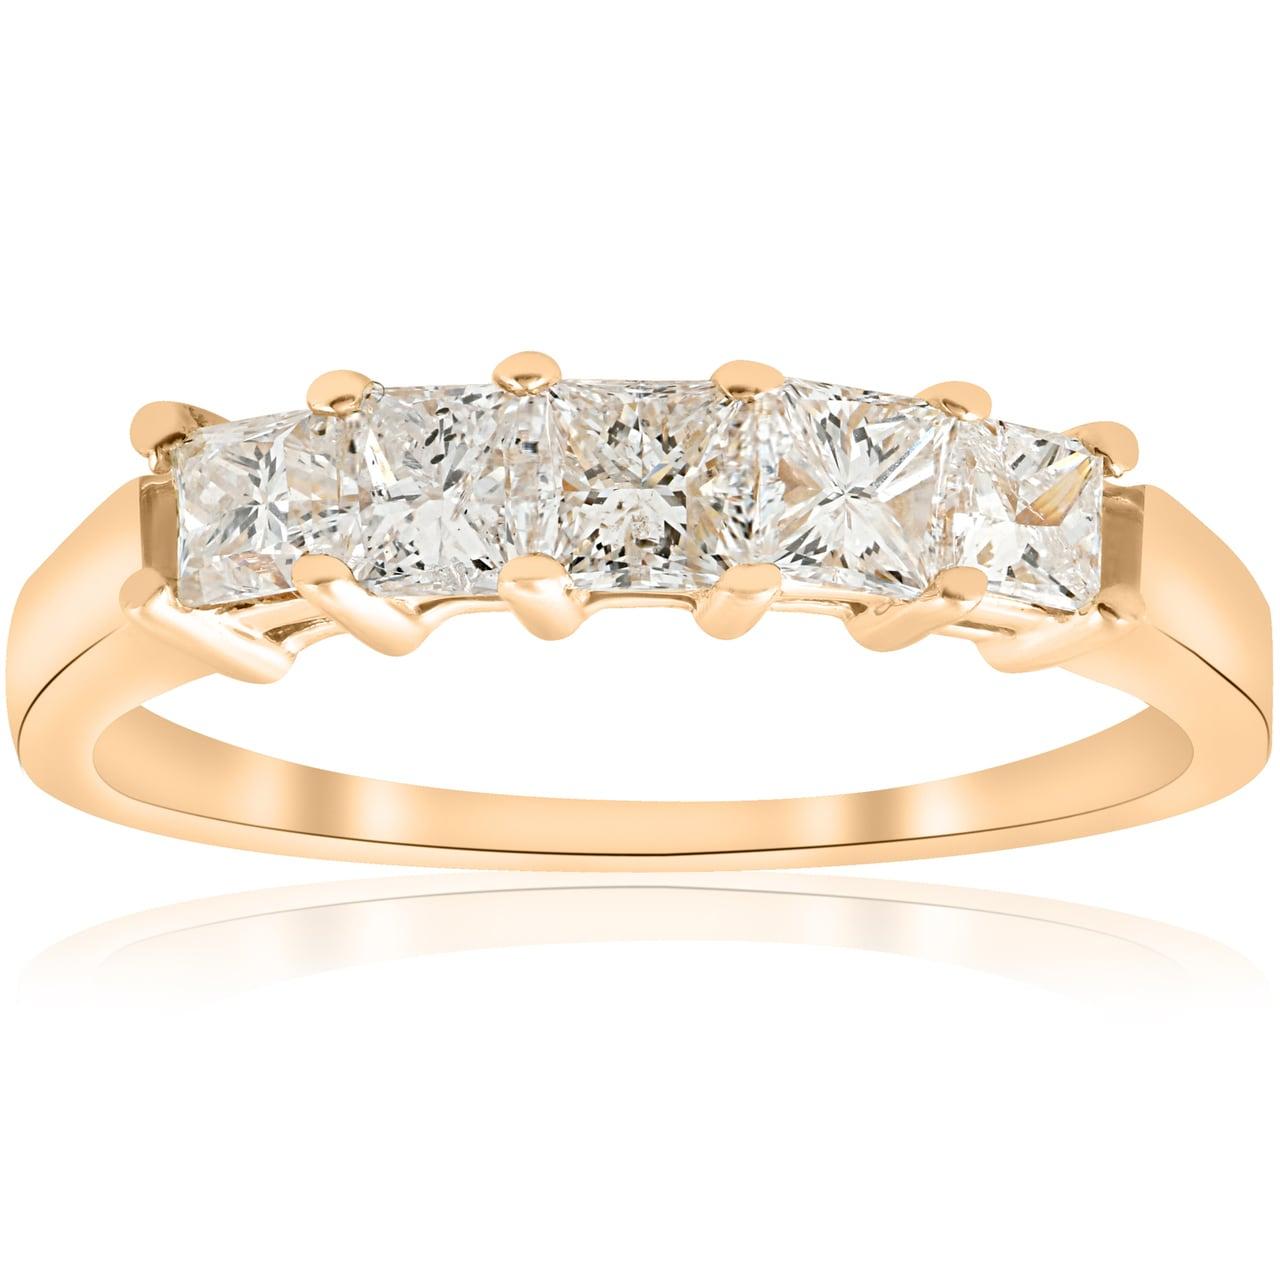 2 Ct Princess Diamond Engagement Wedding Anniversary Ring 14k White Gold 5-Stone